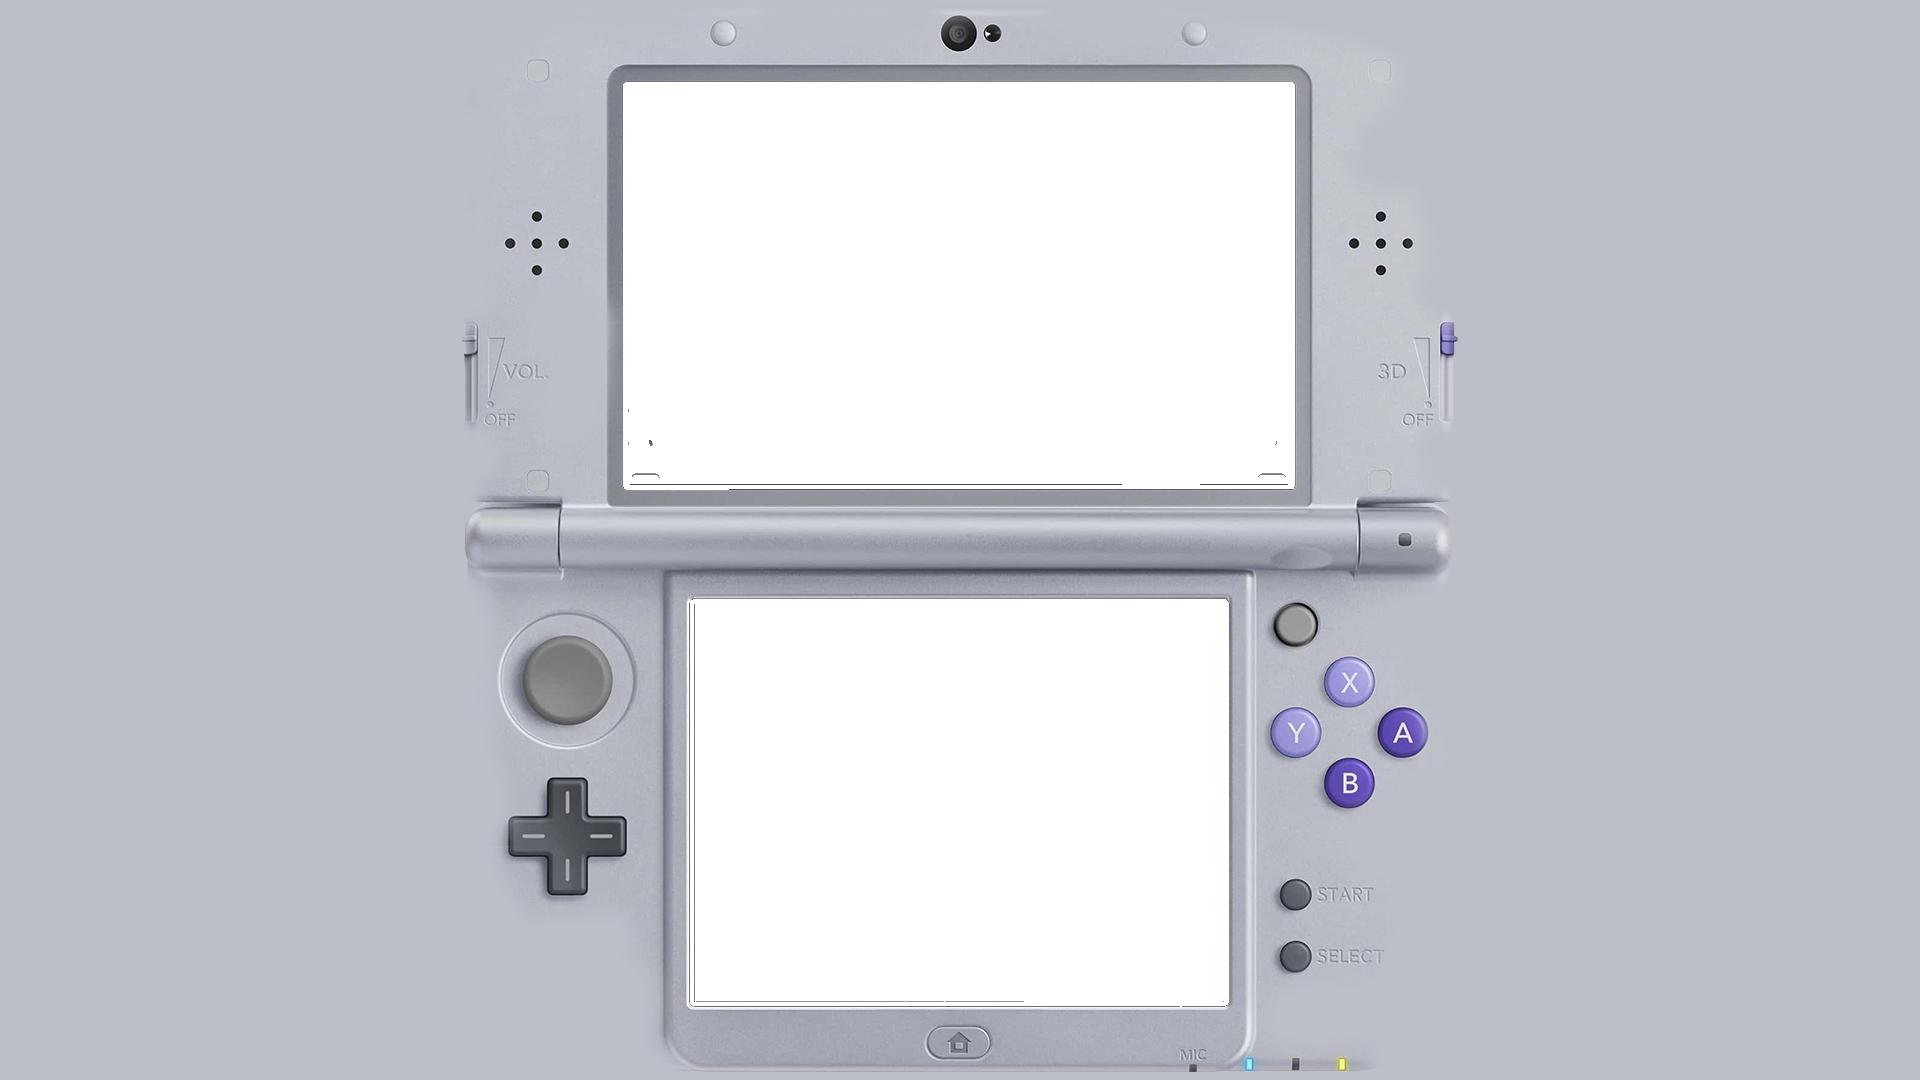 Nintendo 3ds overlay.